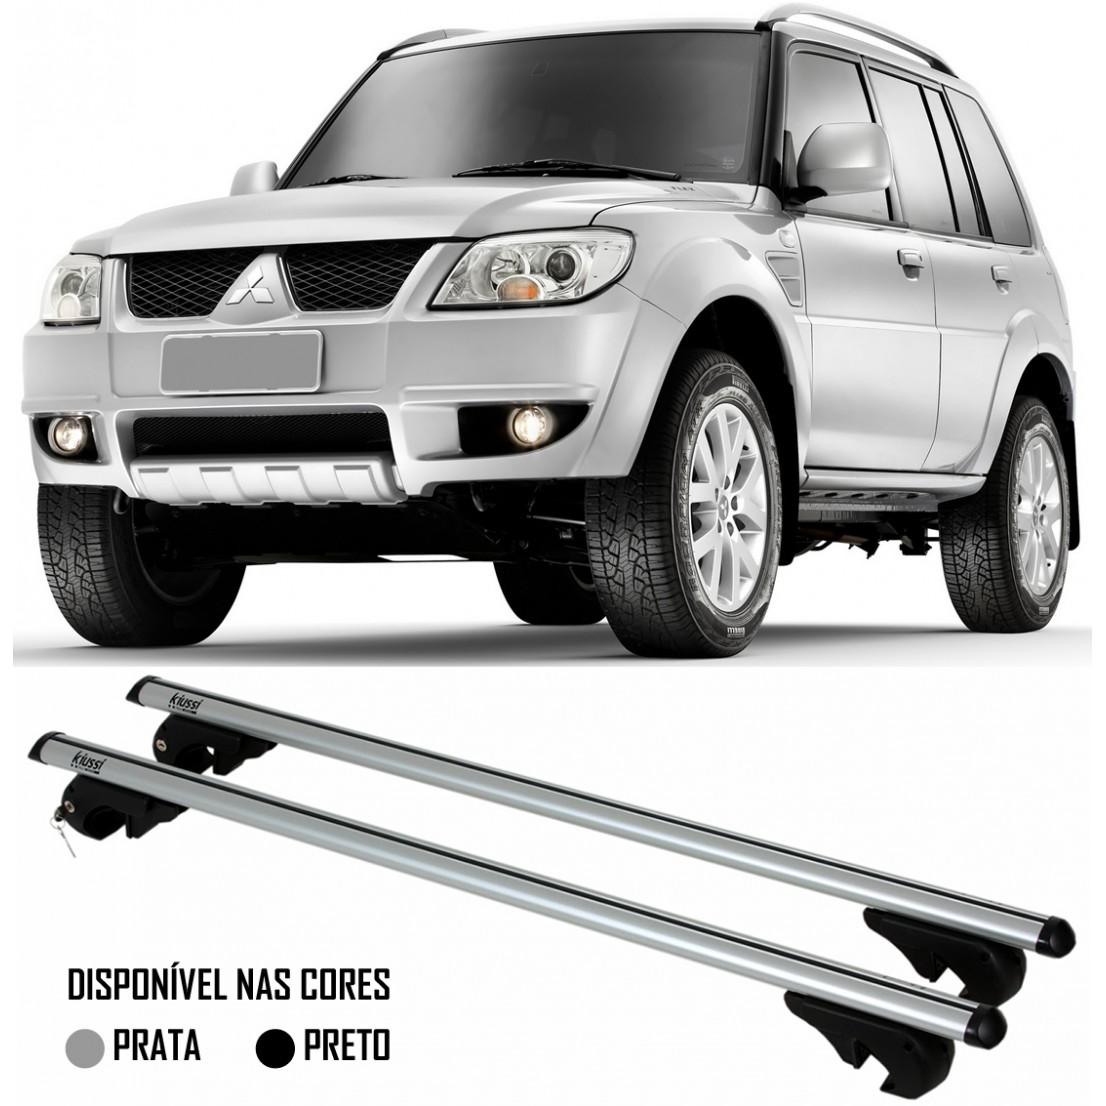 Rack Travessa Mitsubishi TR4 2007 2008 2009 2010 2011 2012 2013 2014 2015 - Kiussi Alumínio Com Chave 50KG - Preto / Prata